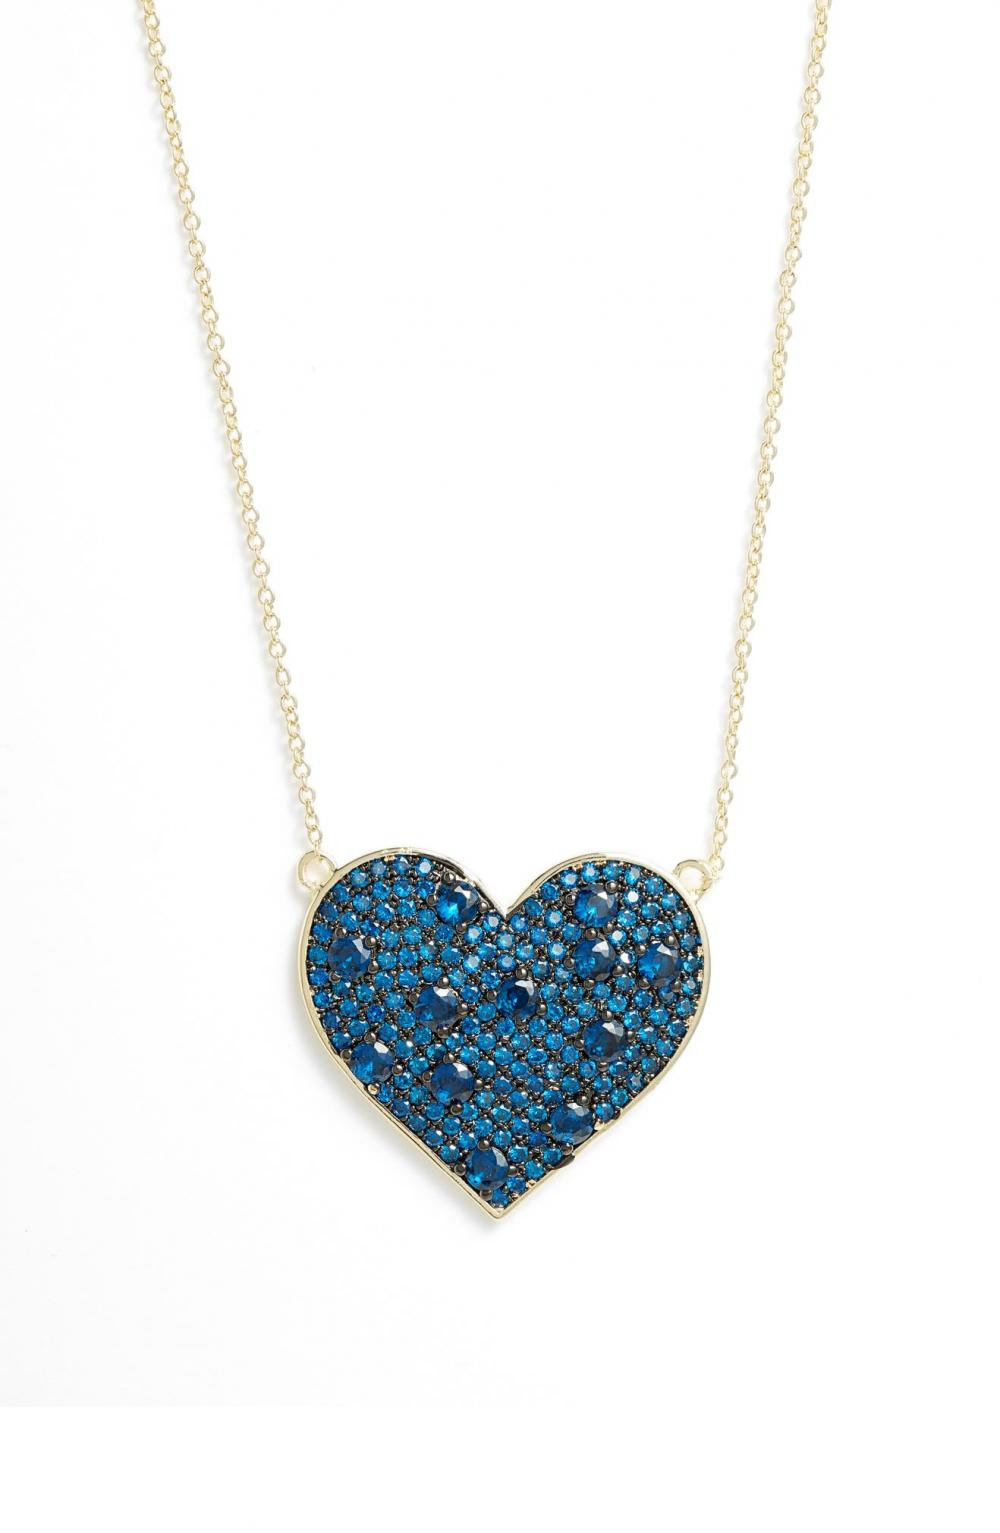 Cubic Zirconia Heart Pendant Necklace